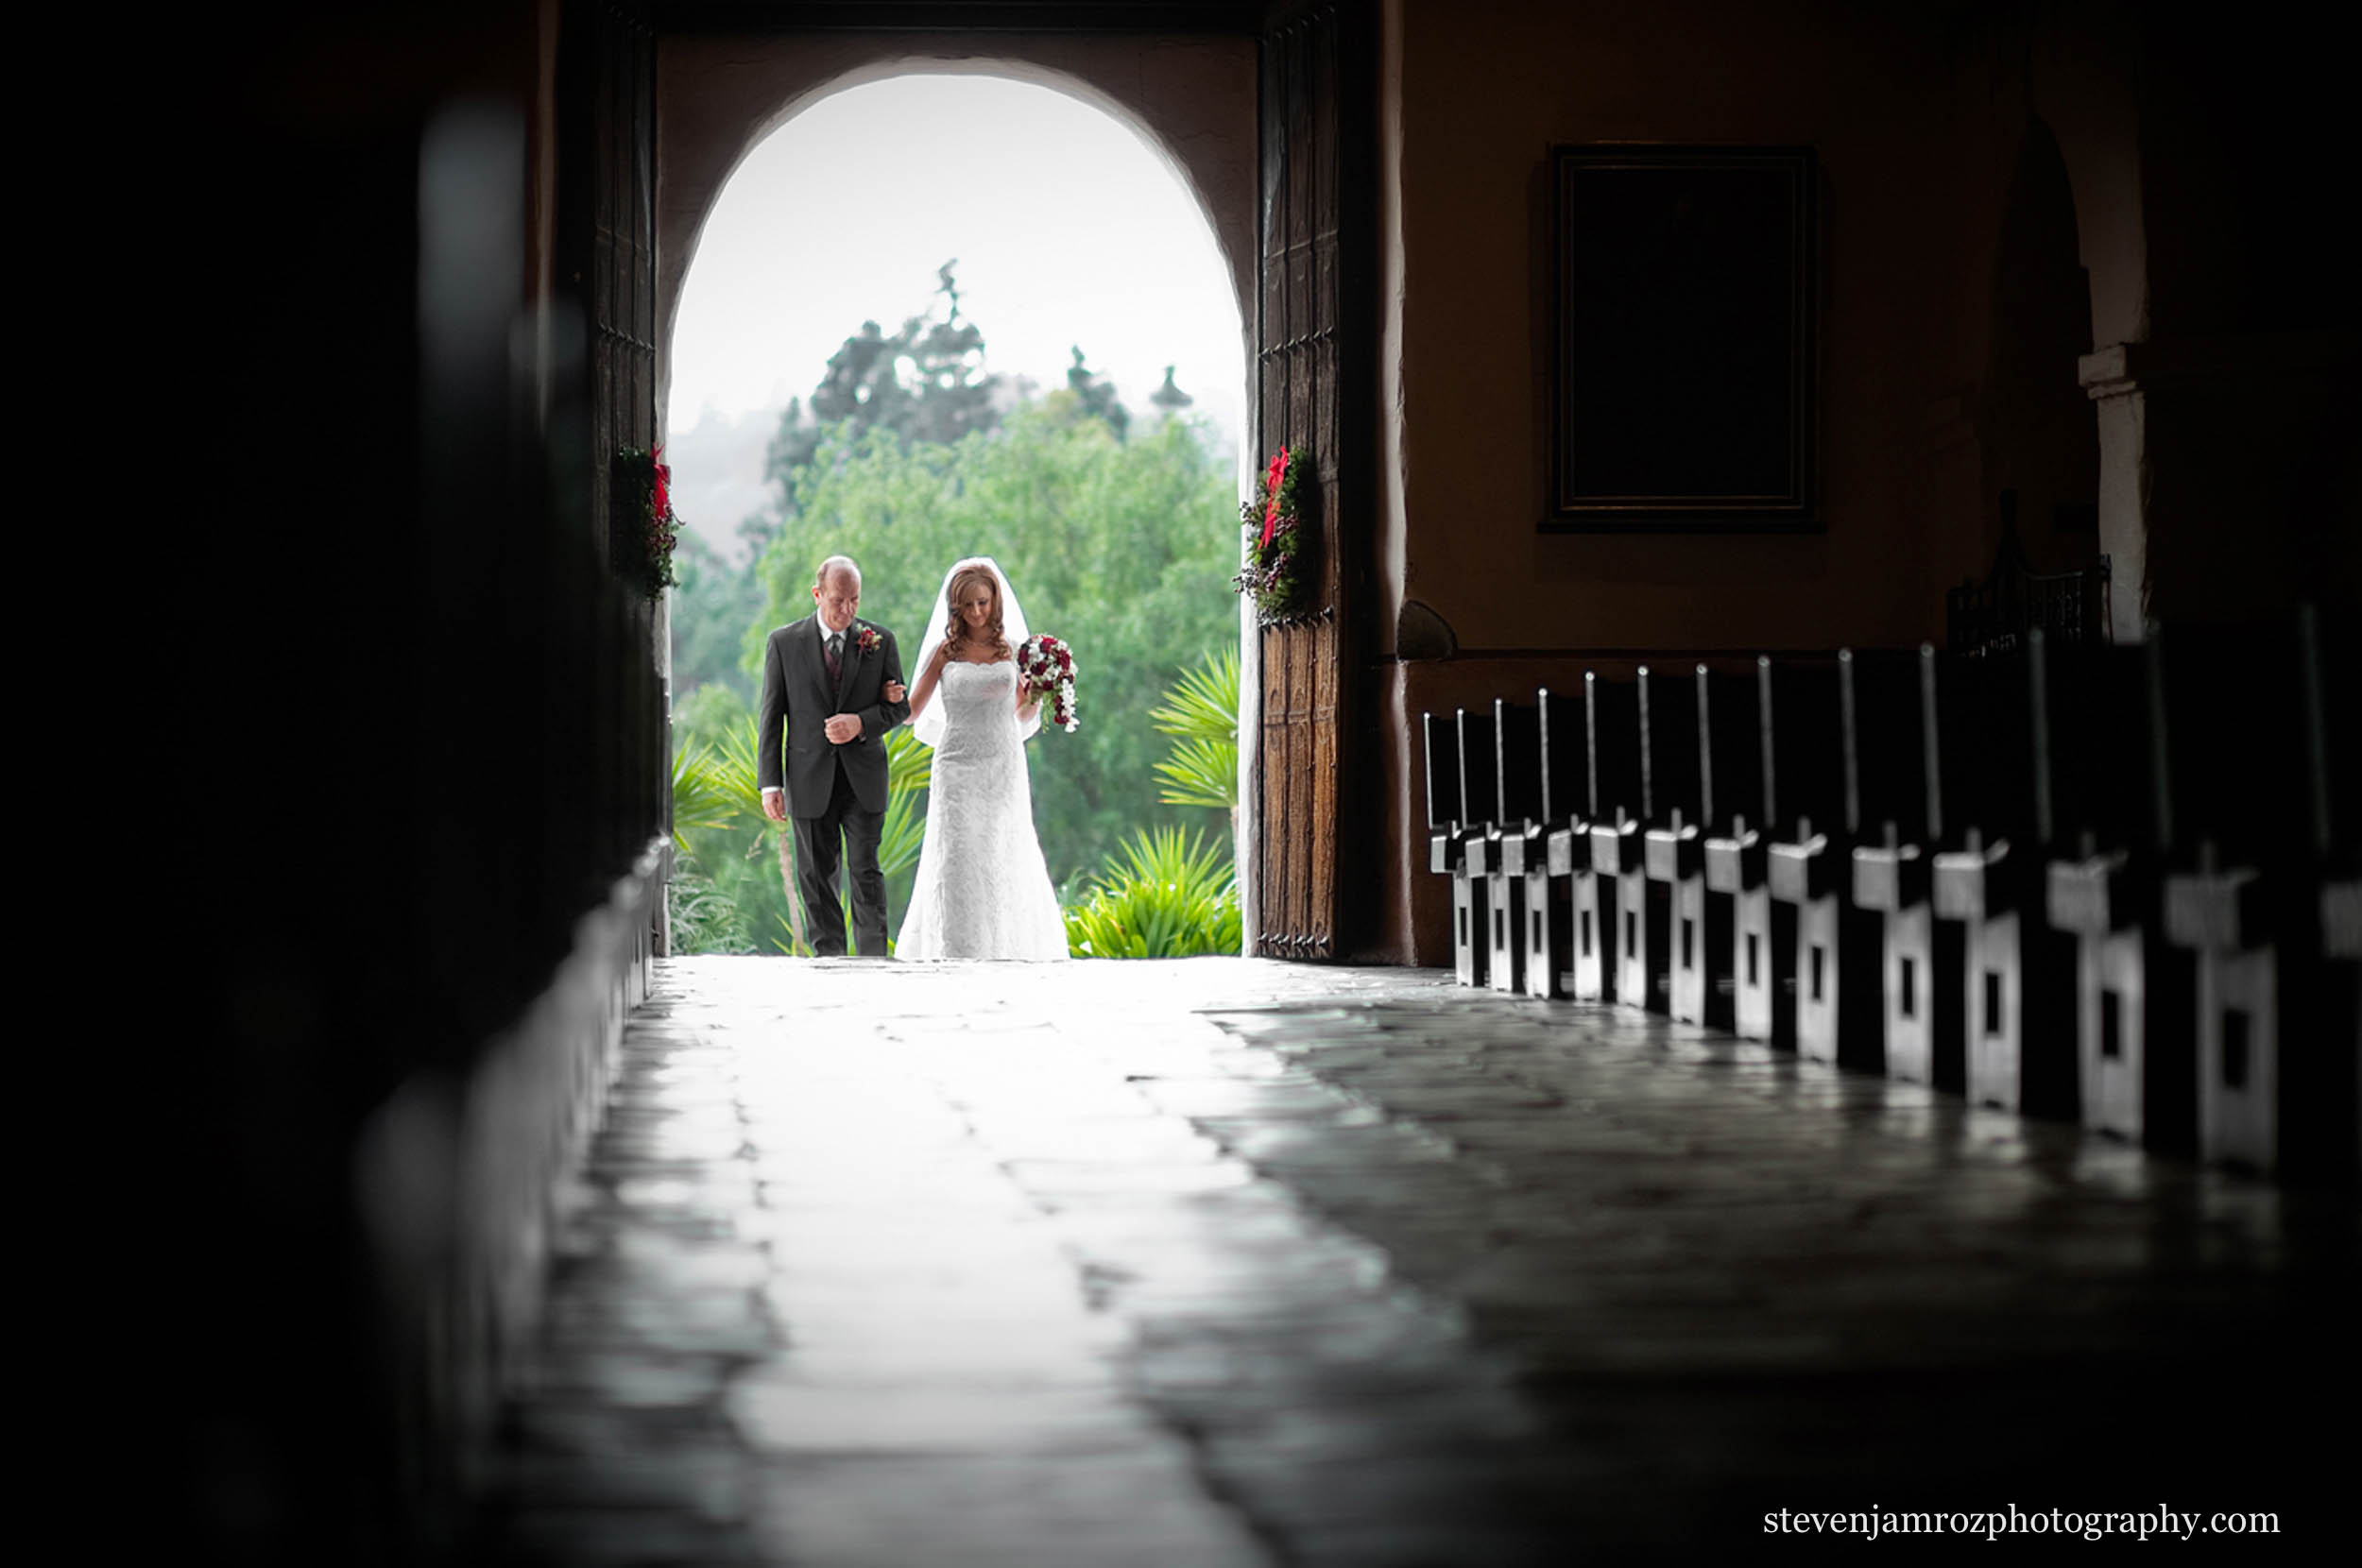 old-church-wedding-raliegh-nc-photographer-steven-jamroz-0728.jpg